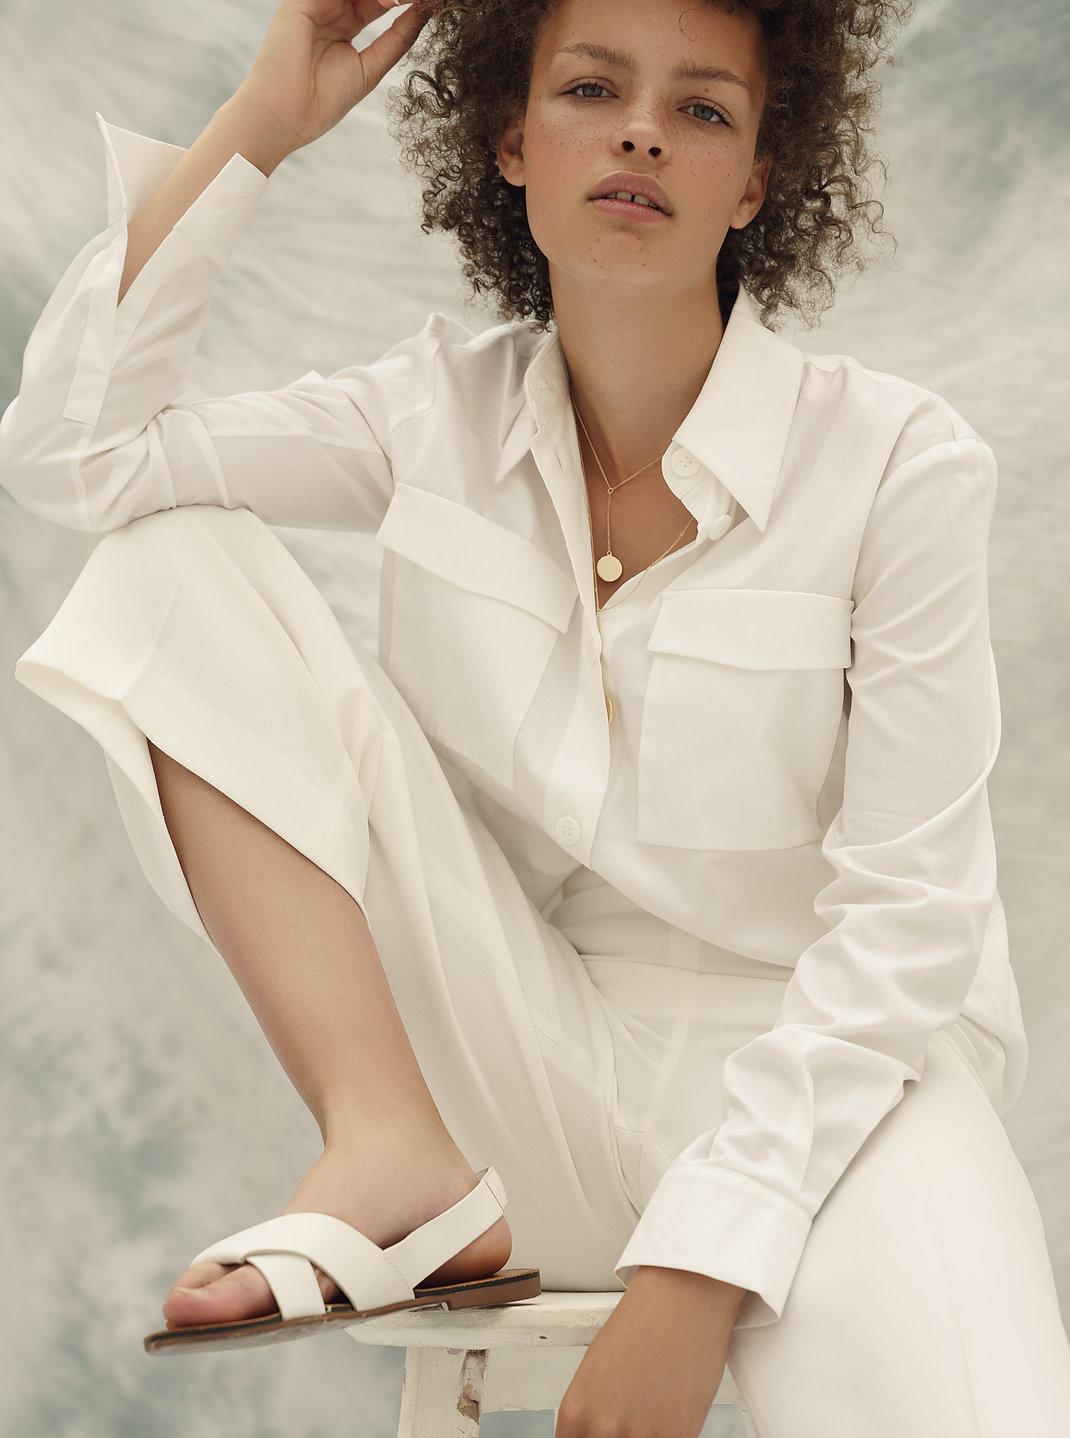 Photo by: Oliver Rudolph Model: Levi Anijs H&M by: Marisol Prada